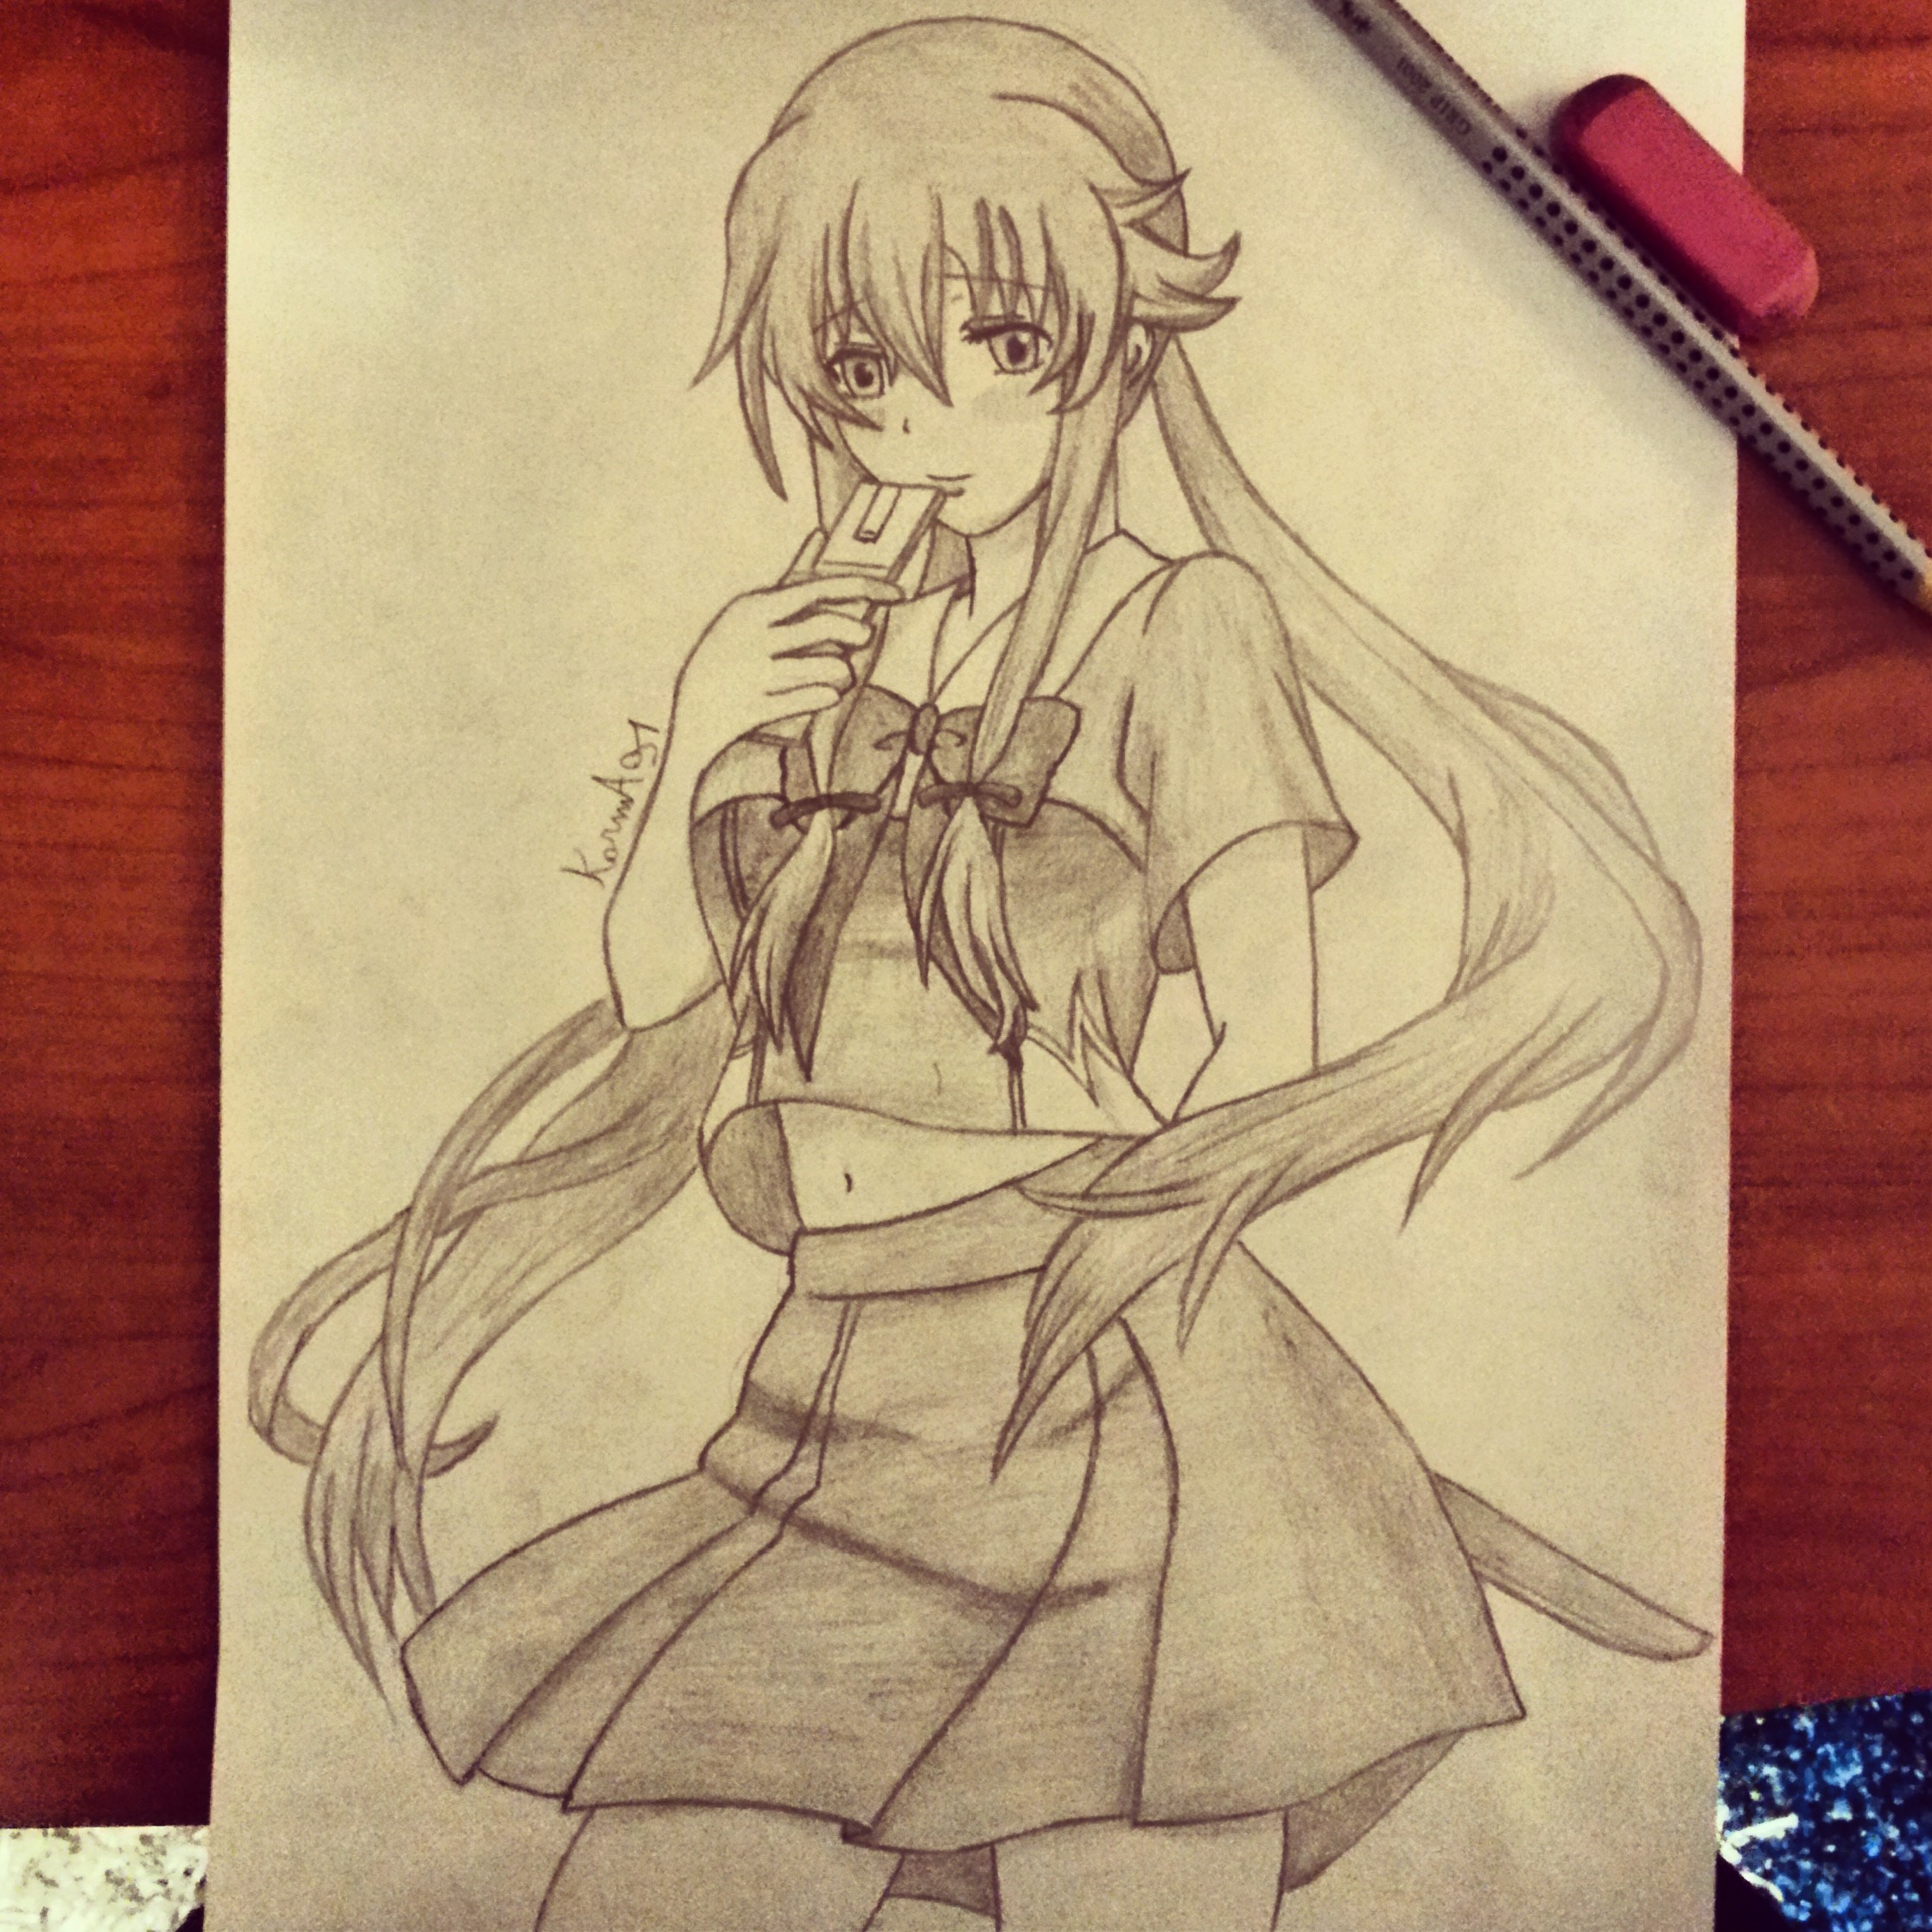 Yuno Gasai from Mirai Nikki - 2 by KarmaSound91